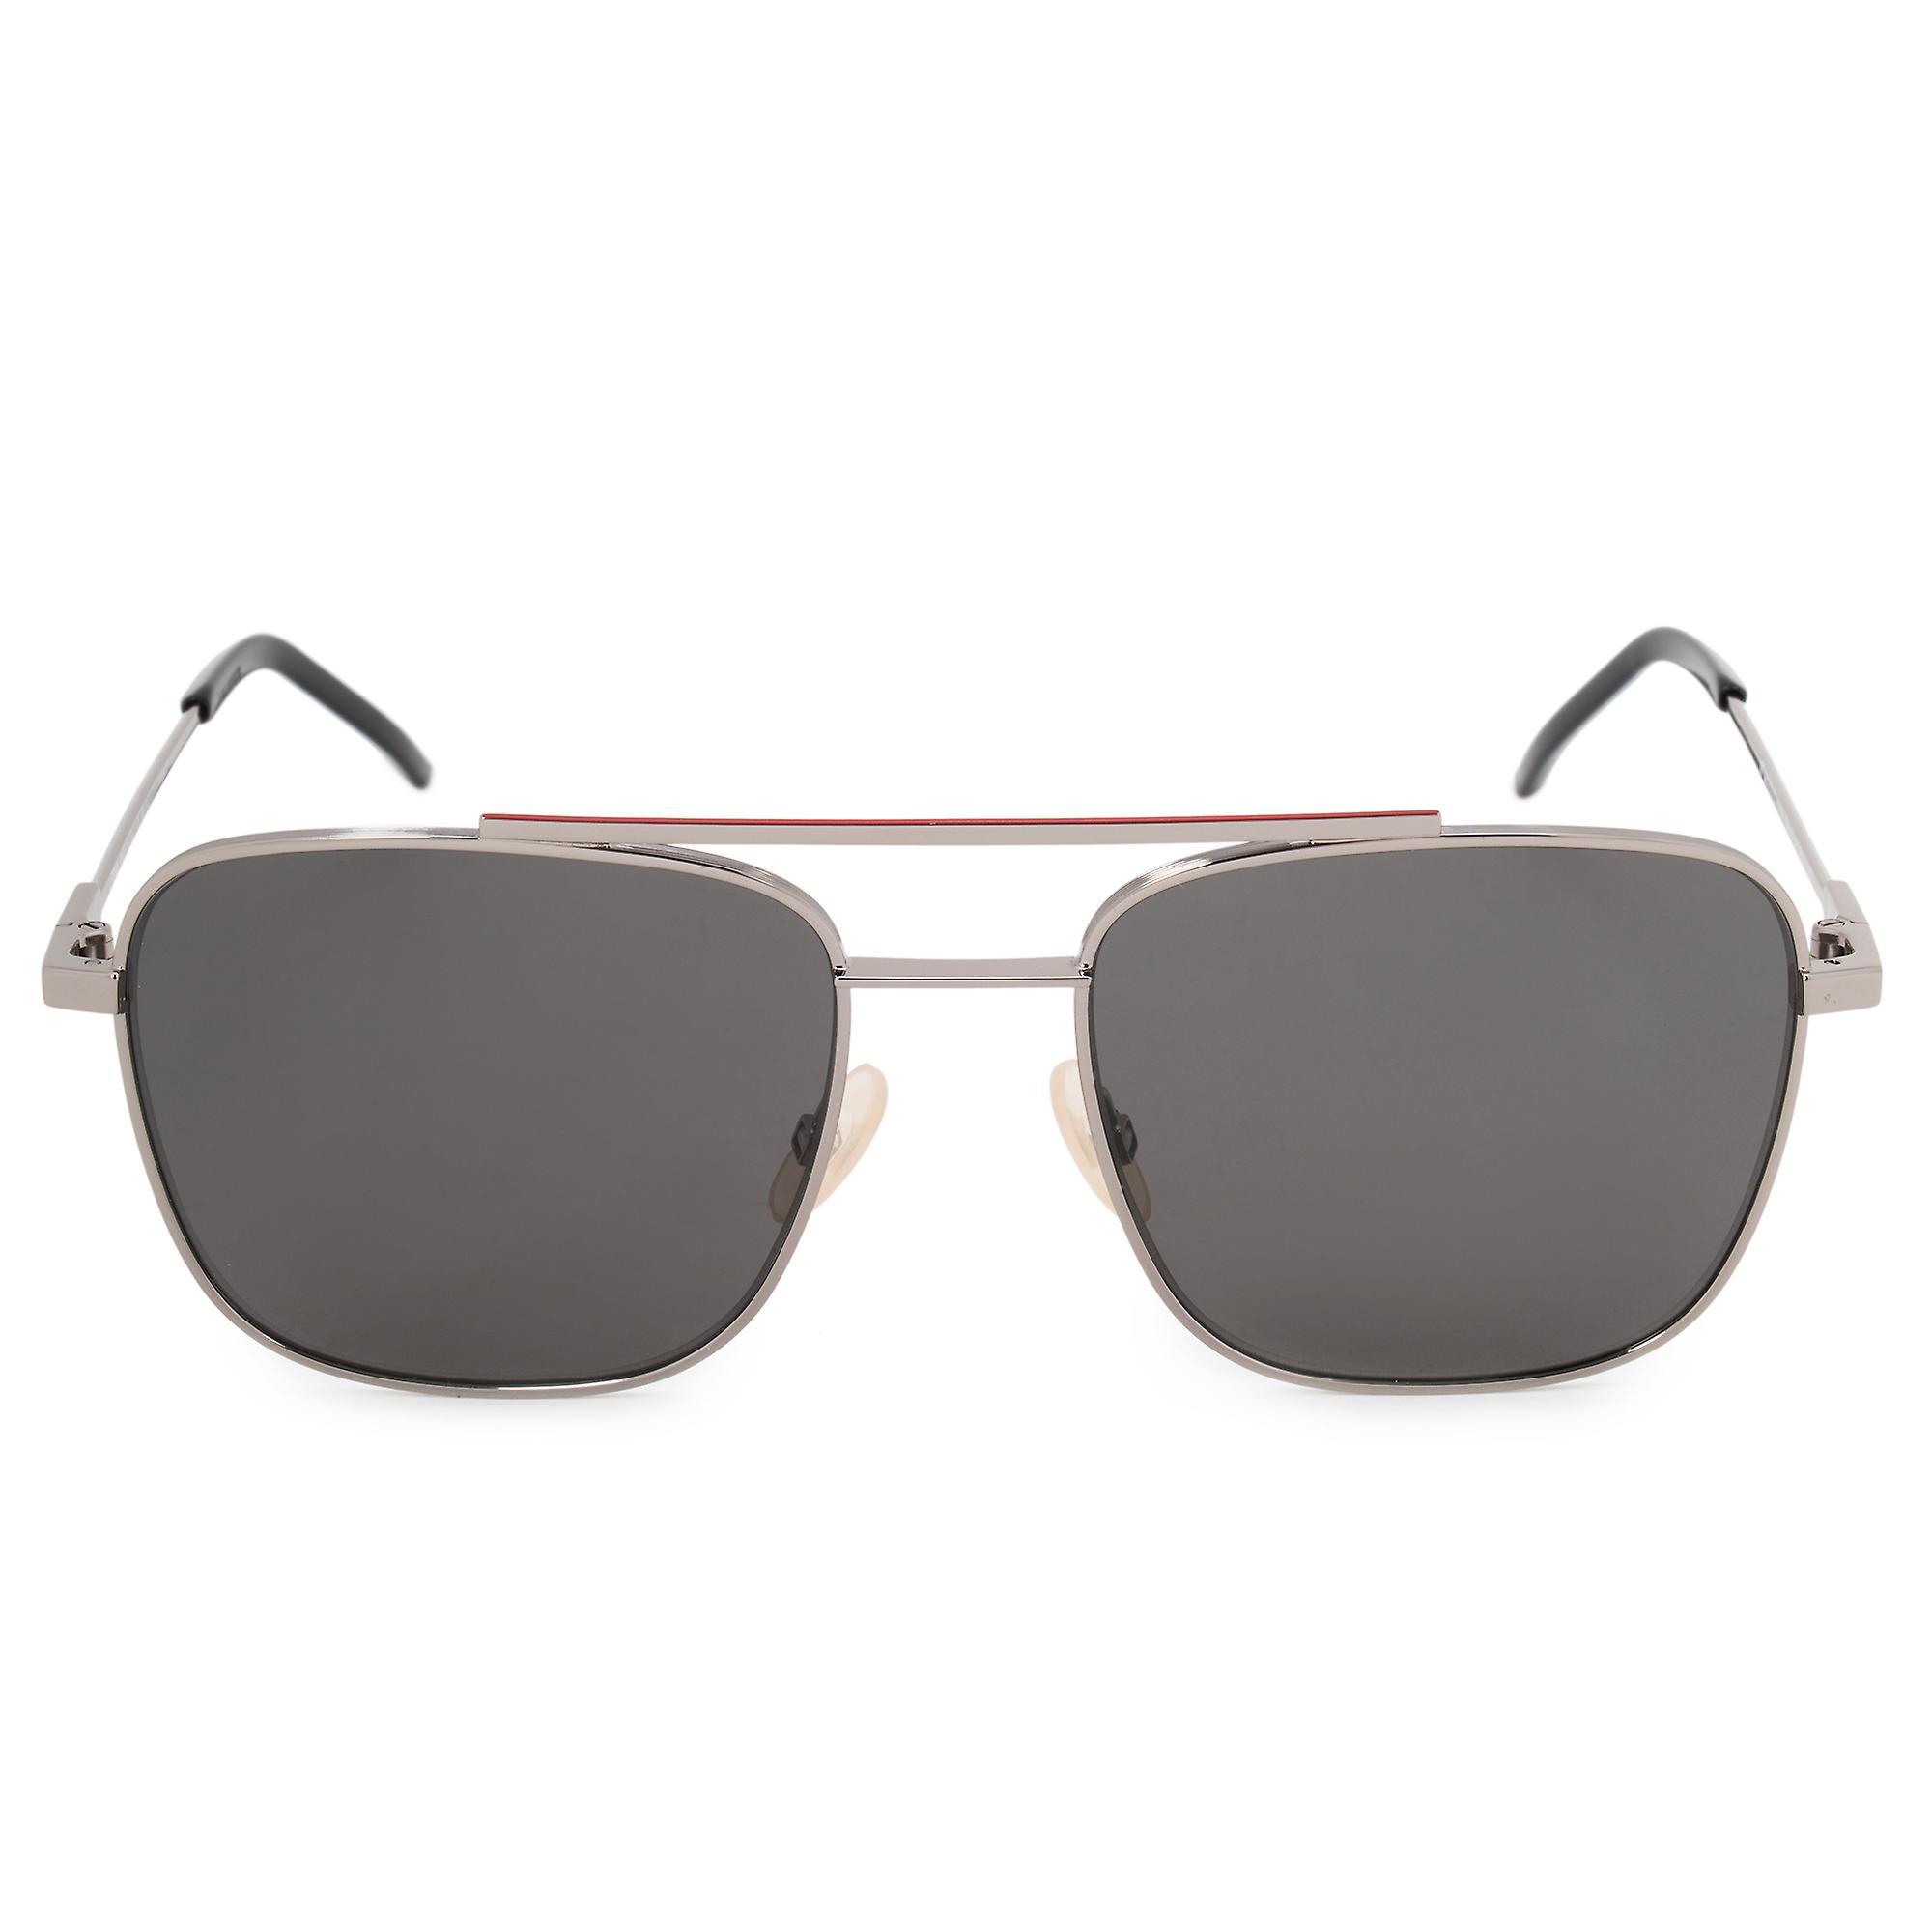 Fendi Square Sunglasses FFM008S KJ1 M9 55 Polarized